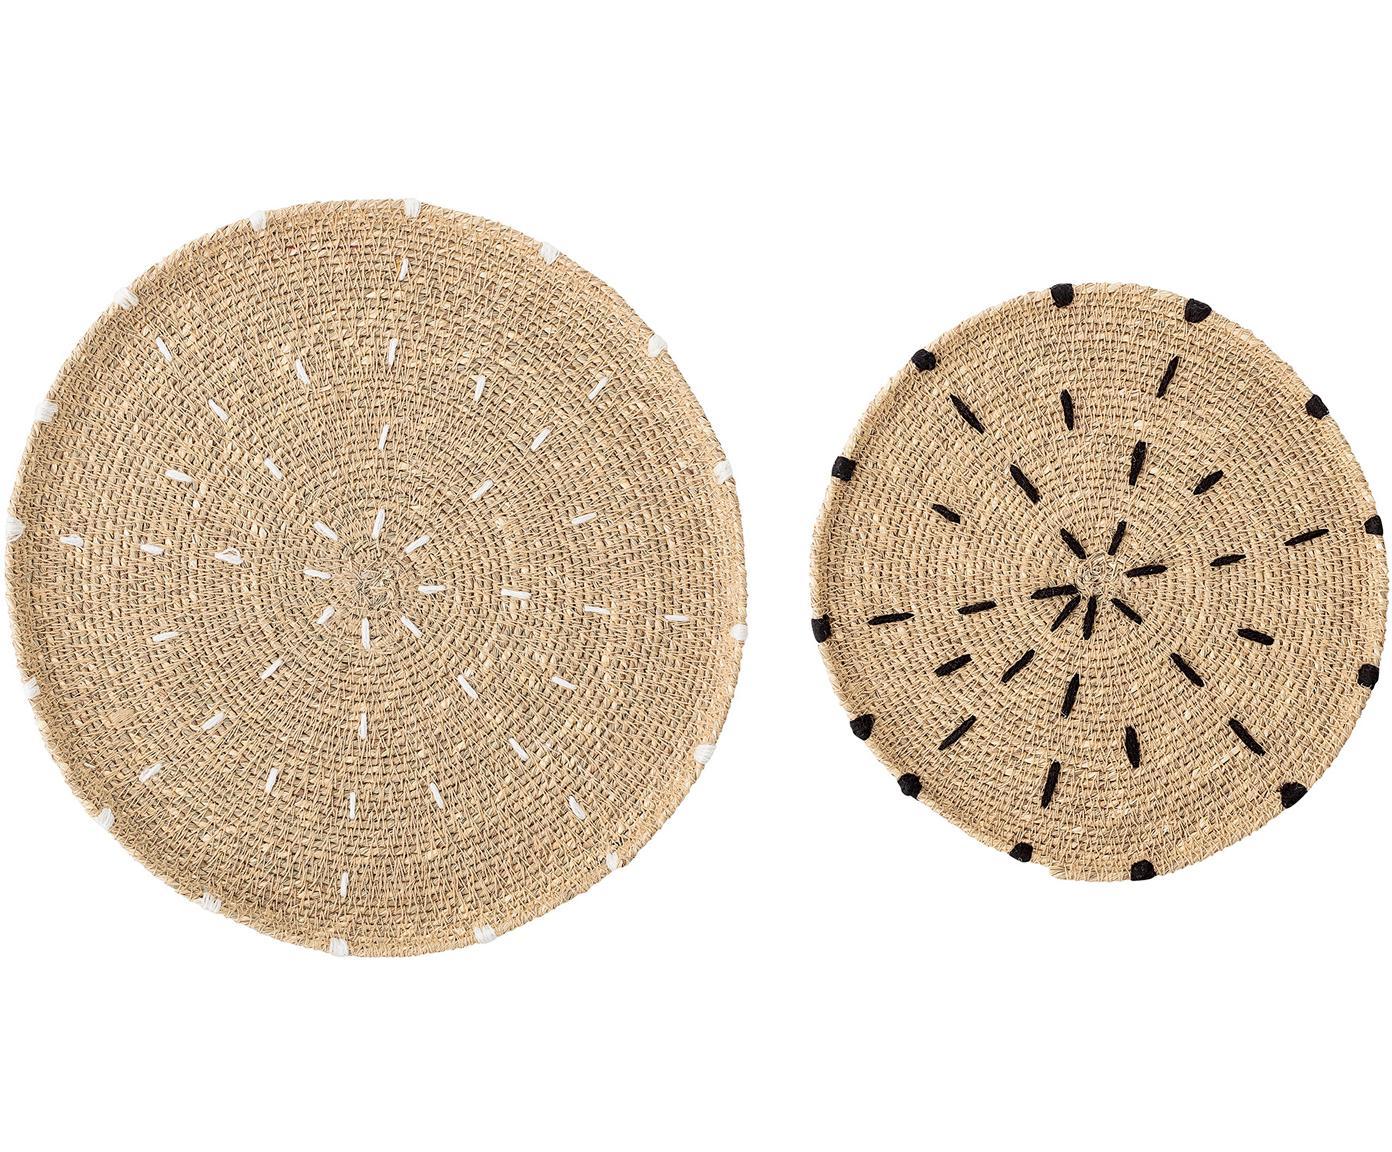 Set de manteles individuales redondos de seagrass WhirlDeco, 2pzas., Seagrass, Beige, blanco, negro, Tamaños diferentes